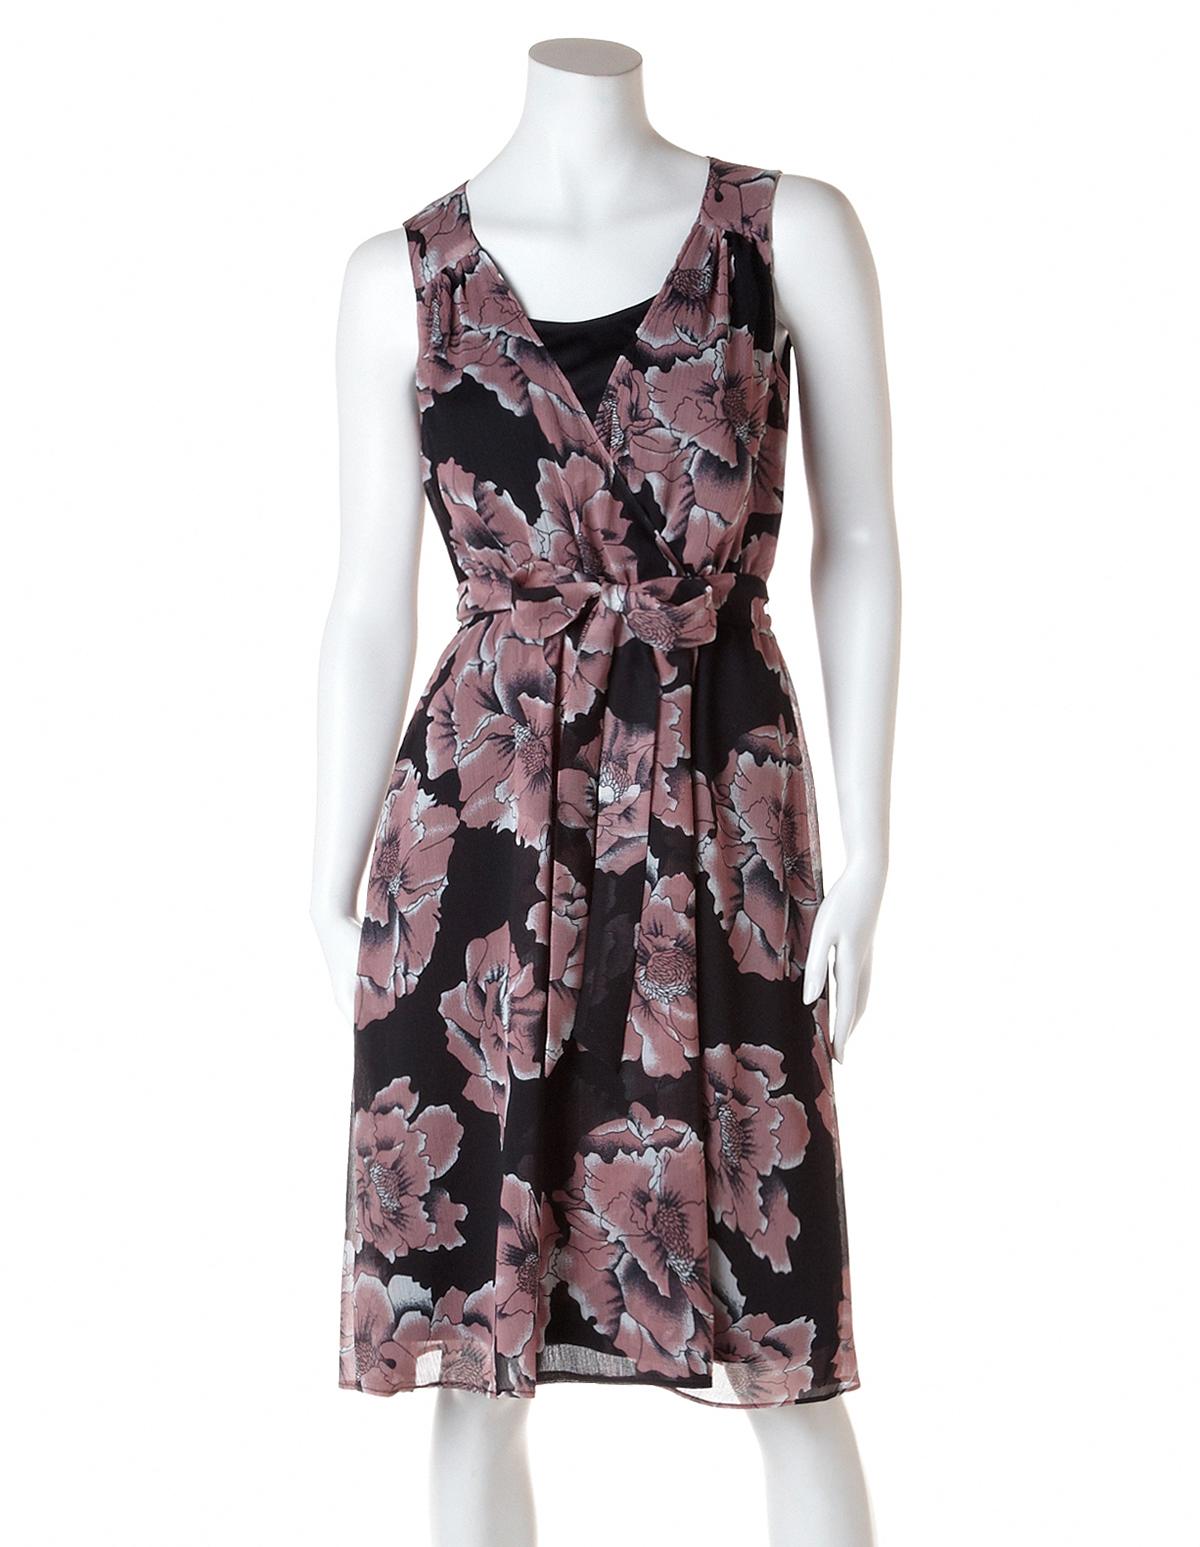 b326cdf196fd7 Blush Floral Fit and Flare Dress, Blush/Black/Ivory, hi-res